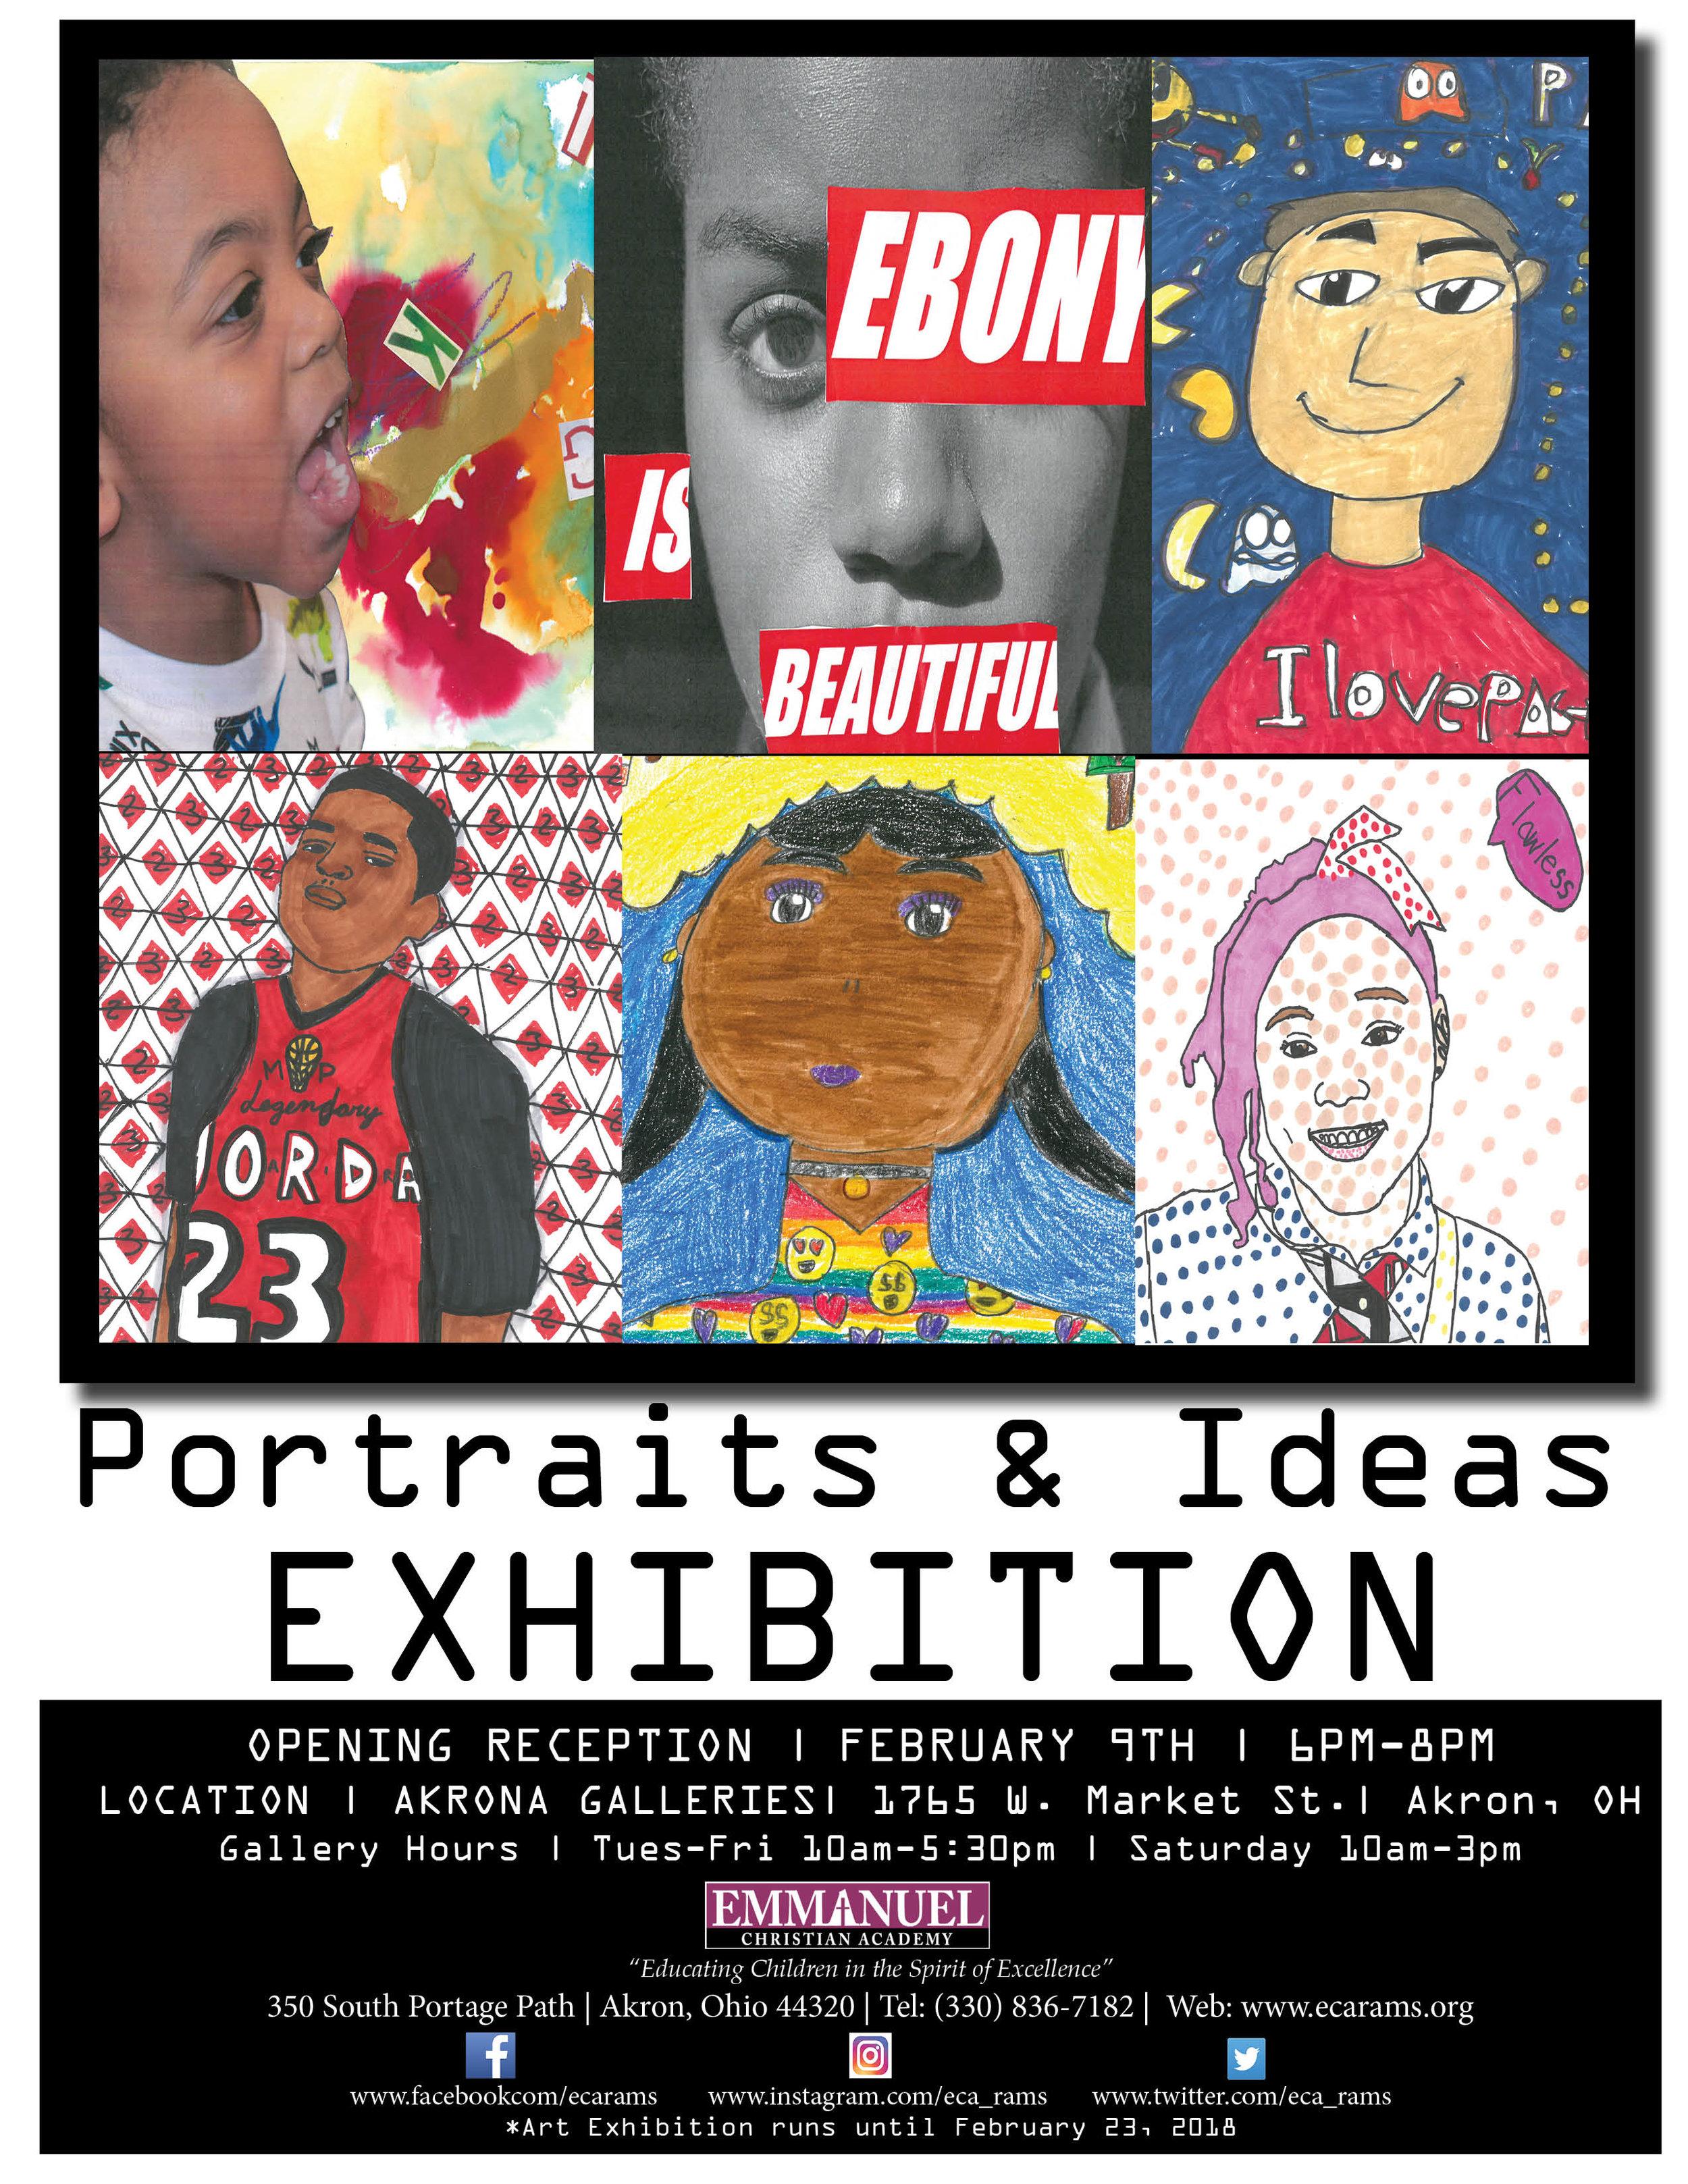 art exhibit 2018 portraits and ideas sample 2 (1).jpg